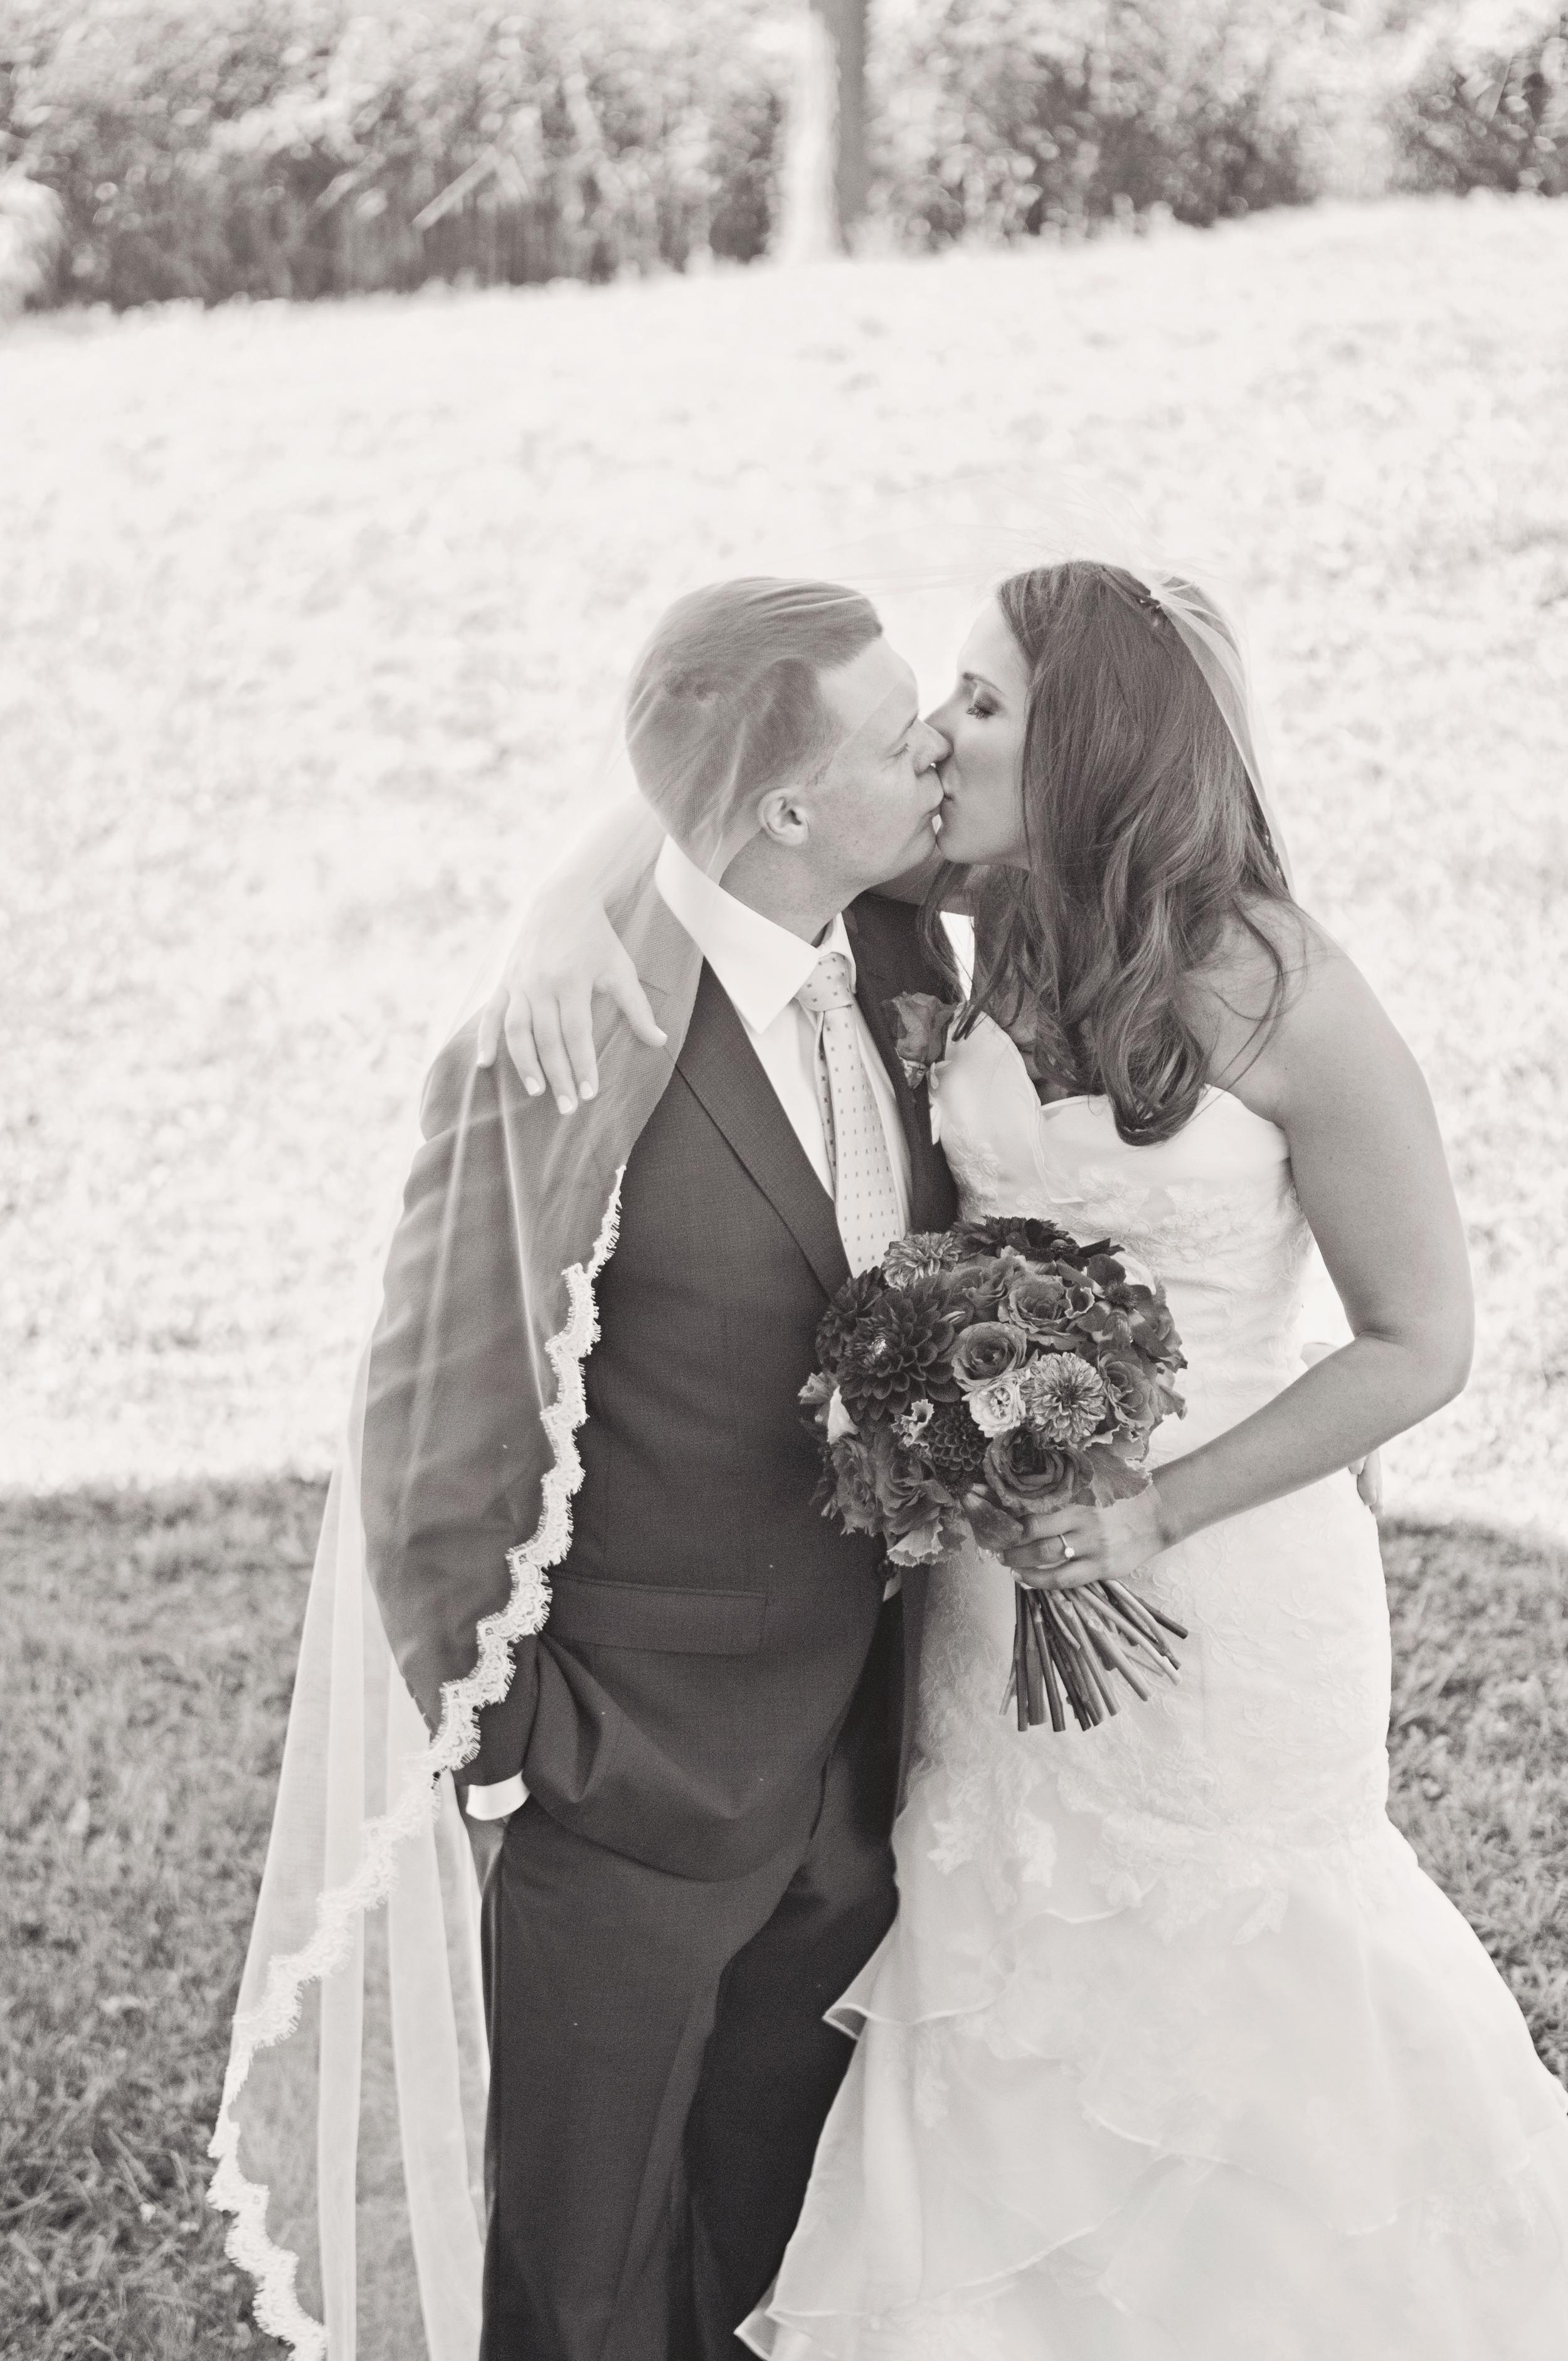 Angela_Chicoski_CT_wedding_photographer_007.jpg